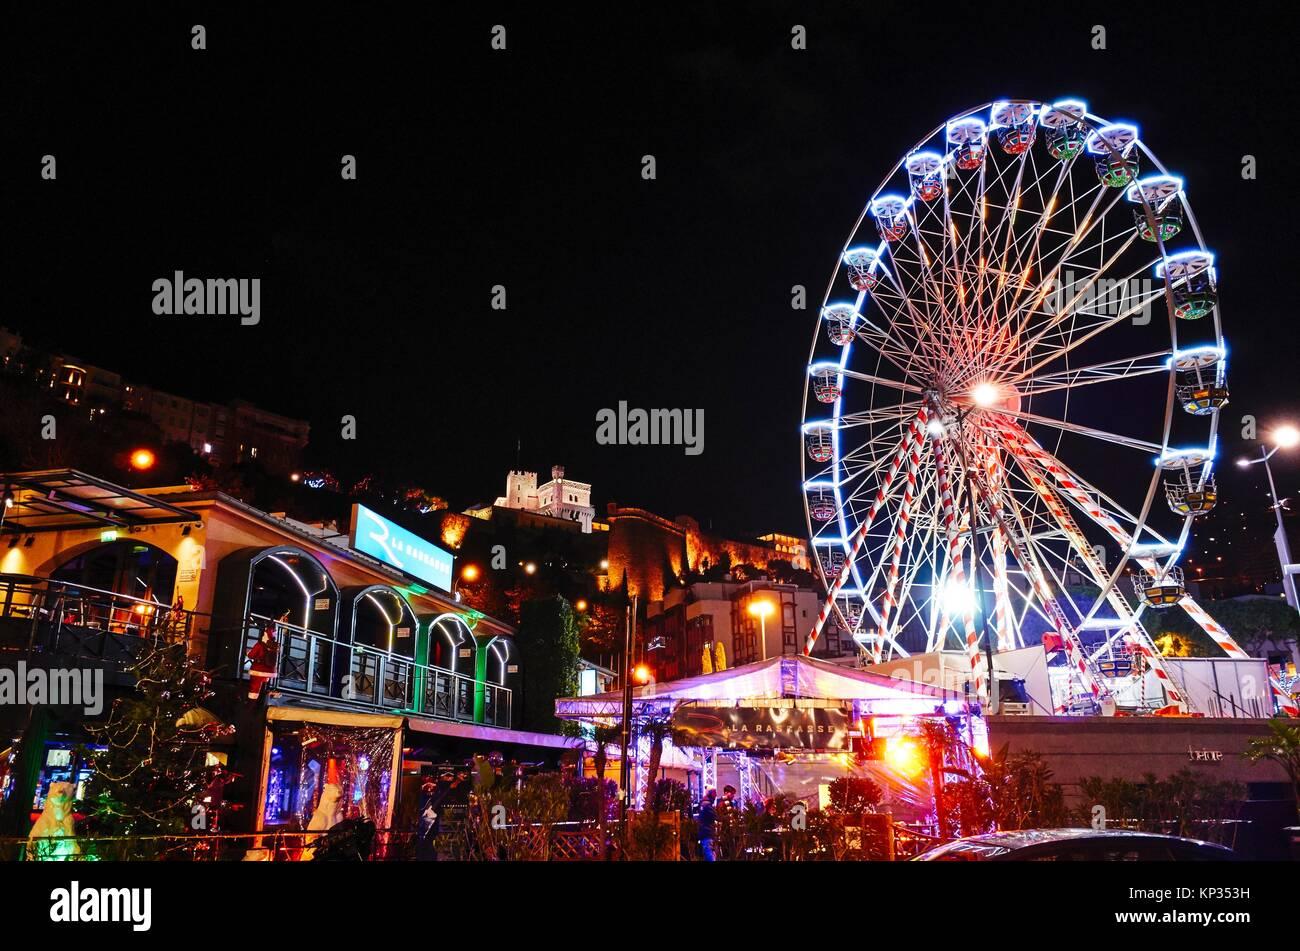 The amusement park by the port of Montecarlo, Monaco Principality - Stock Image